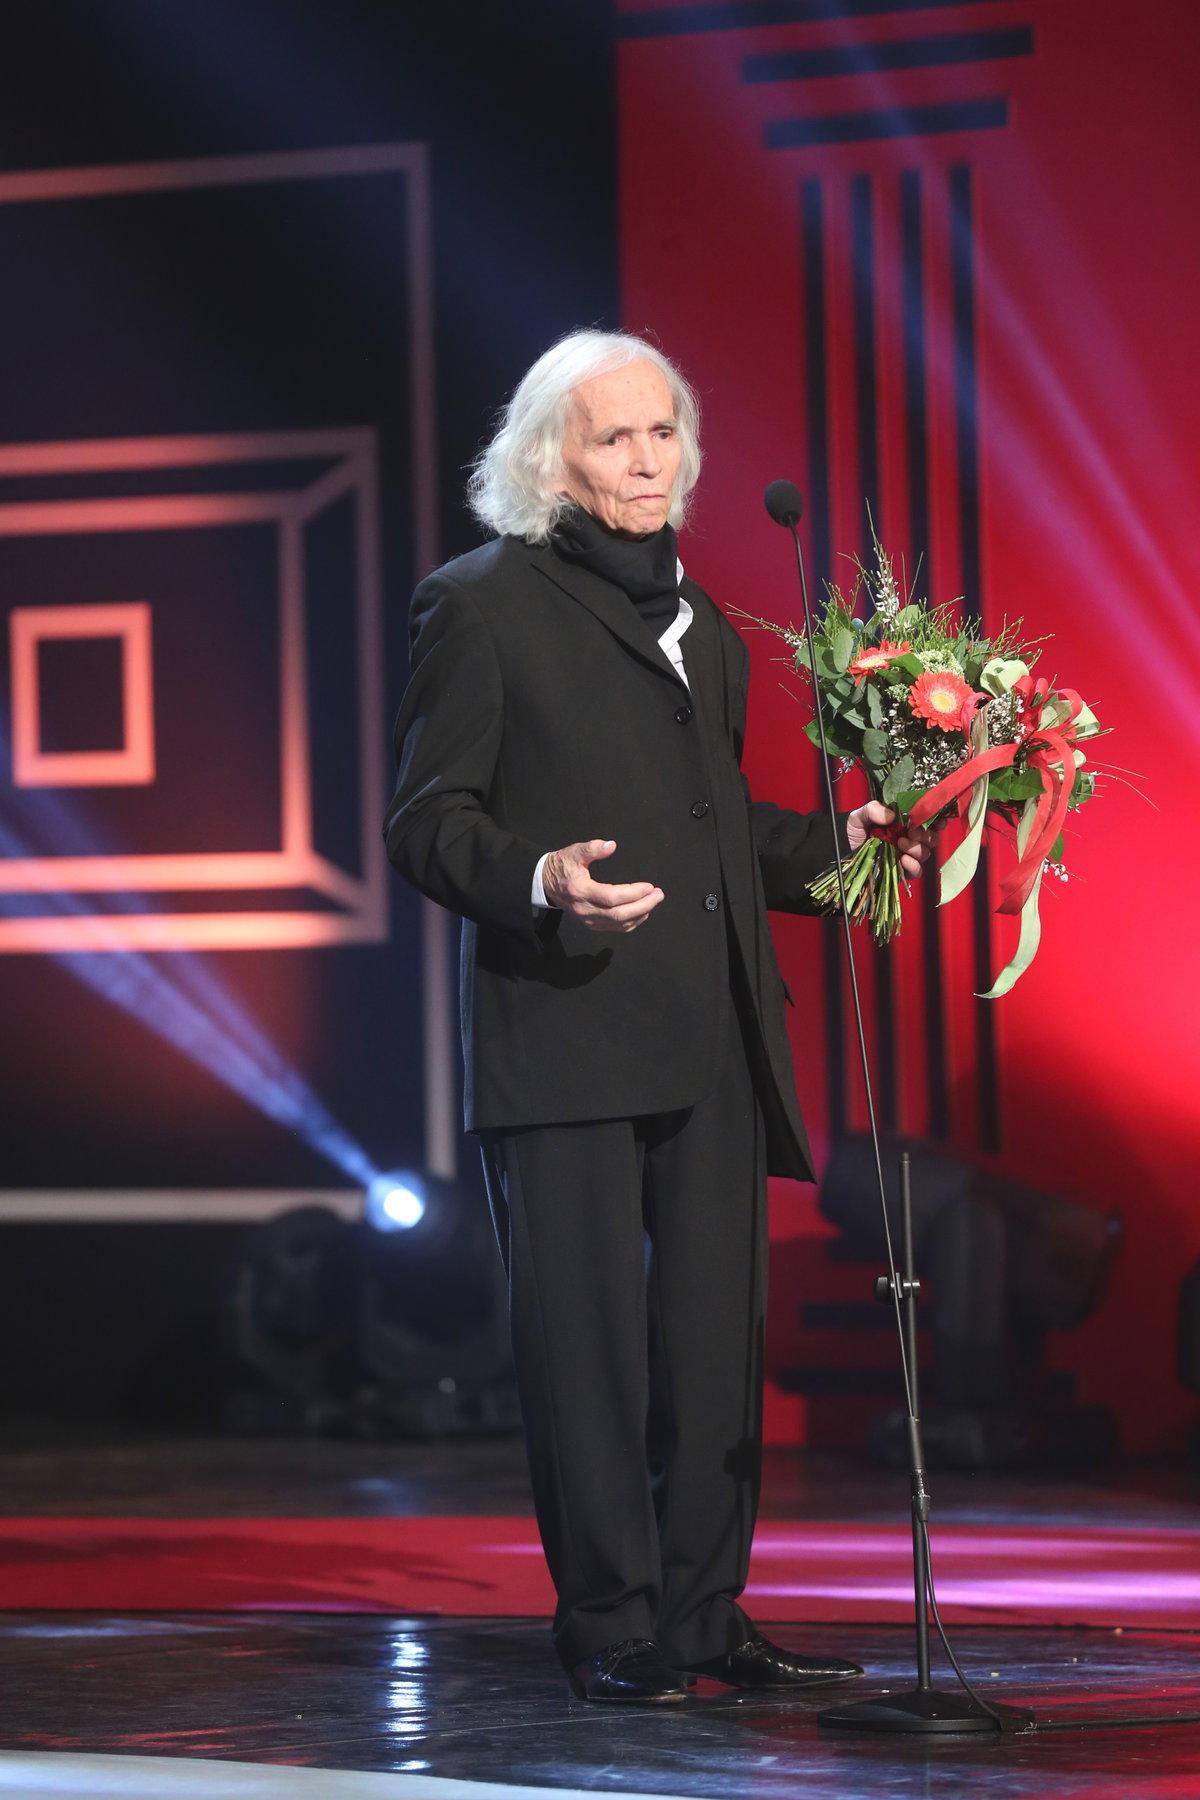 Jiří Srnec